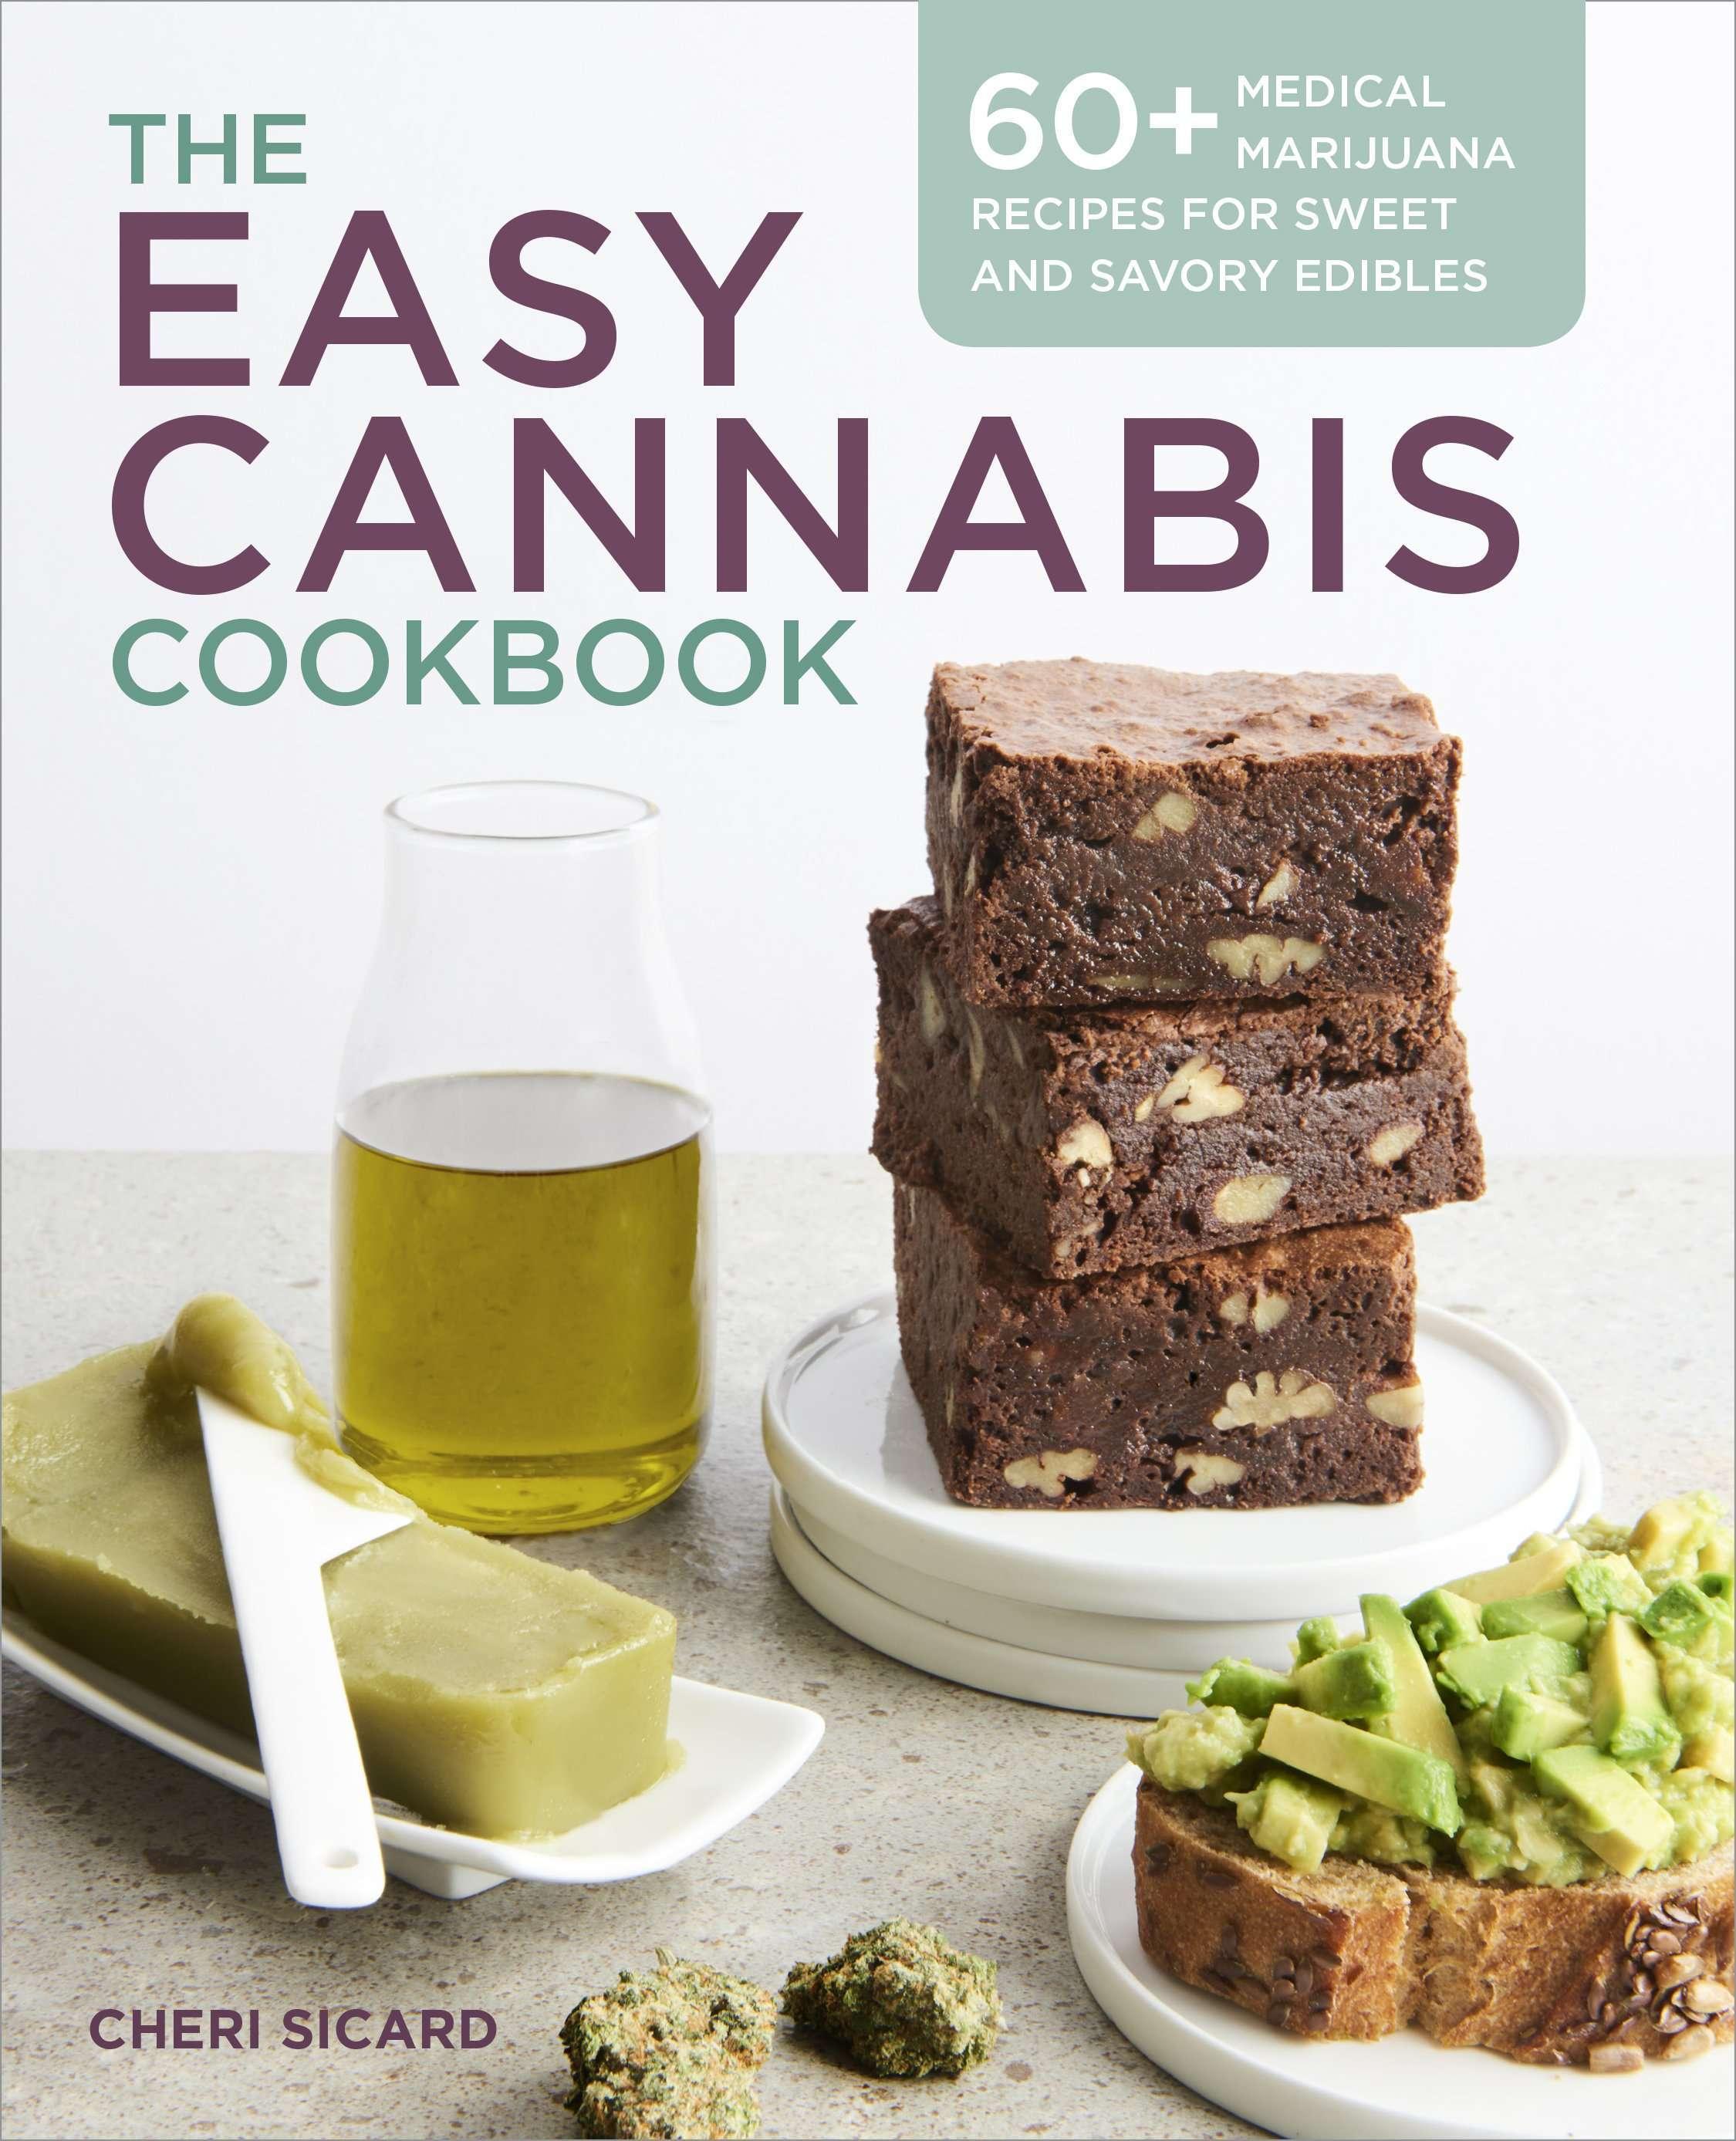 Marijuana TIncture: How to Make a Simple Cannabis Tincture